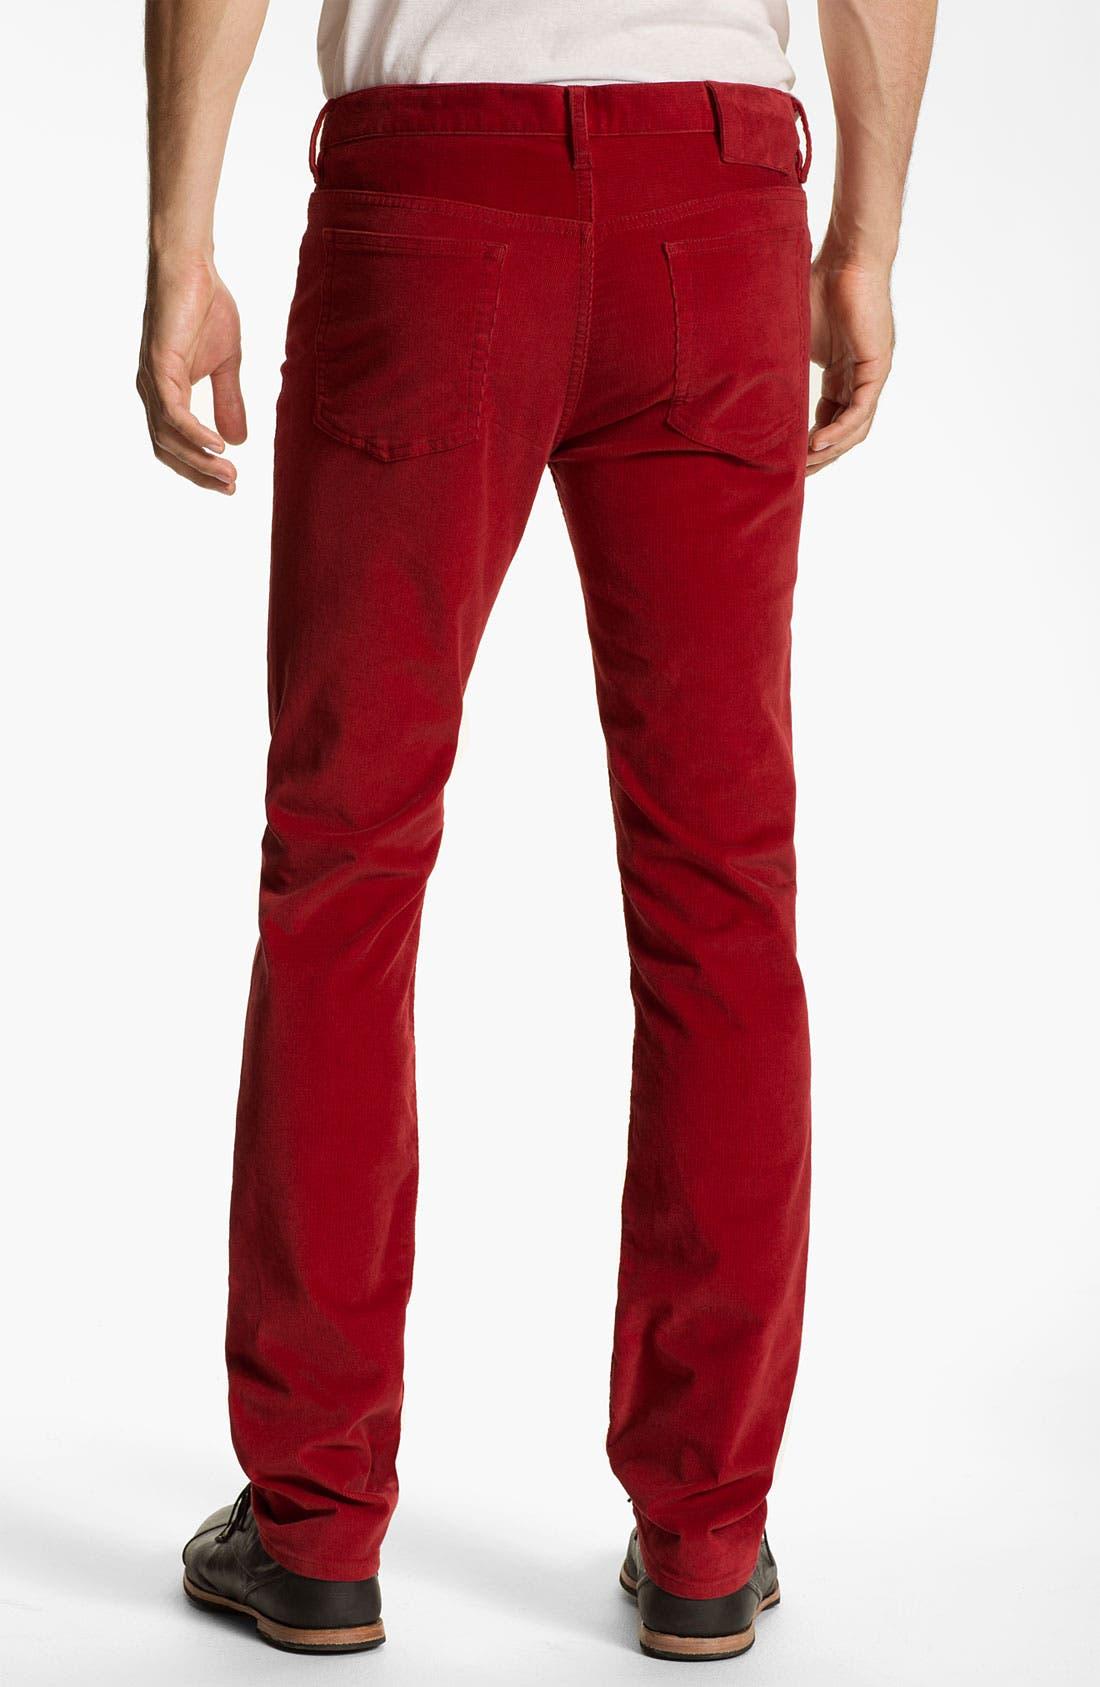 Alternate Image 1 Selected - MARC BY MARC JACOBS Slim Straight Leg Corduroy Pants